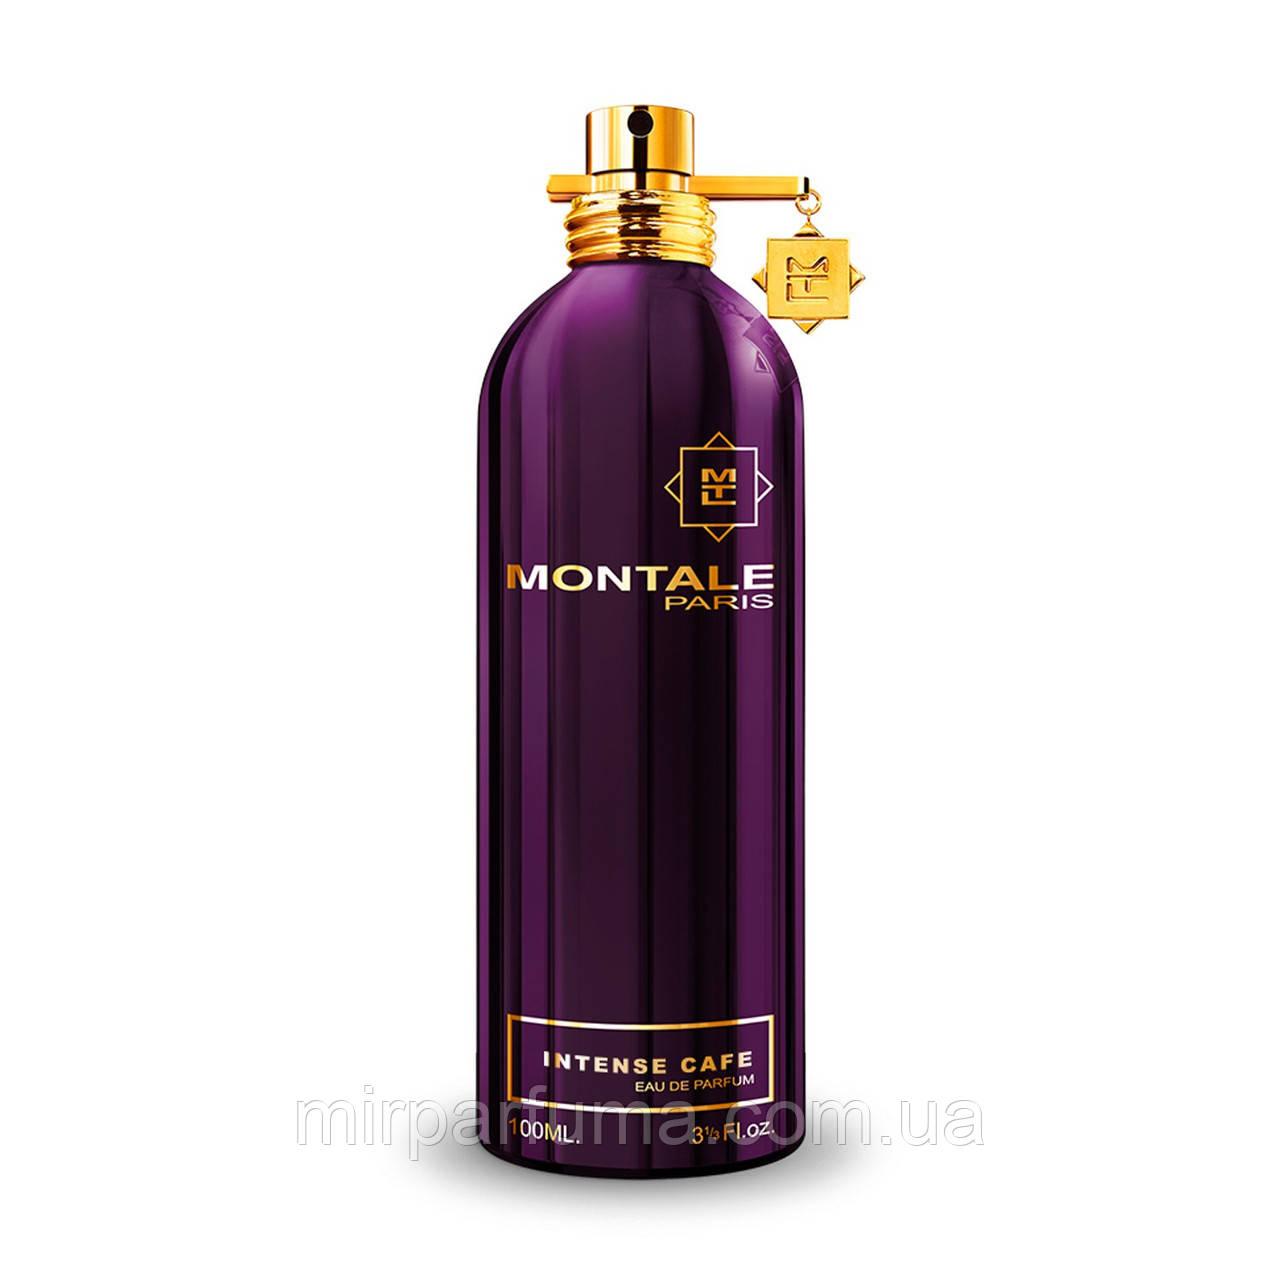 Montale Intense Cafe 100 ml